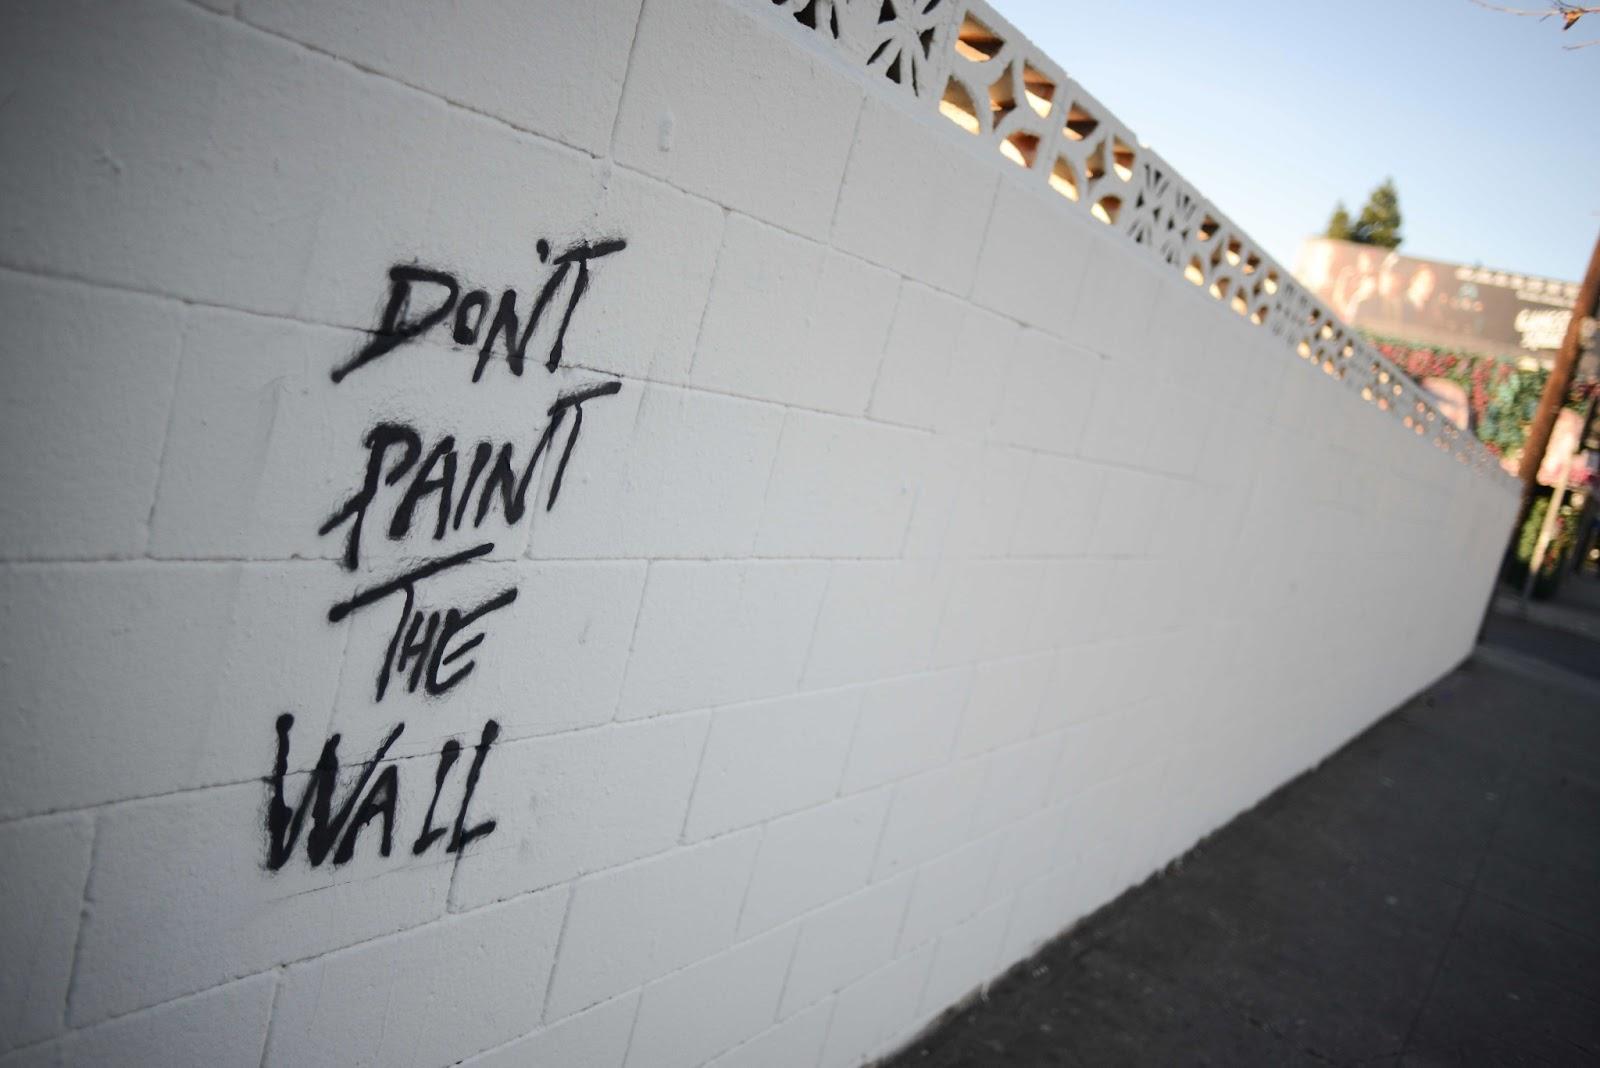 Pintadas, grafittis y otras mierdas del arte hurvano ese. - Página 4 PJ+dont+paint+the+wall-4